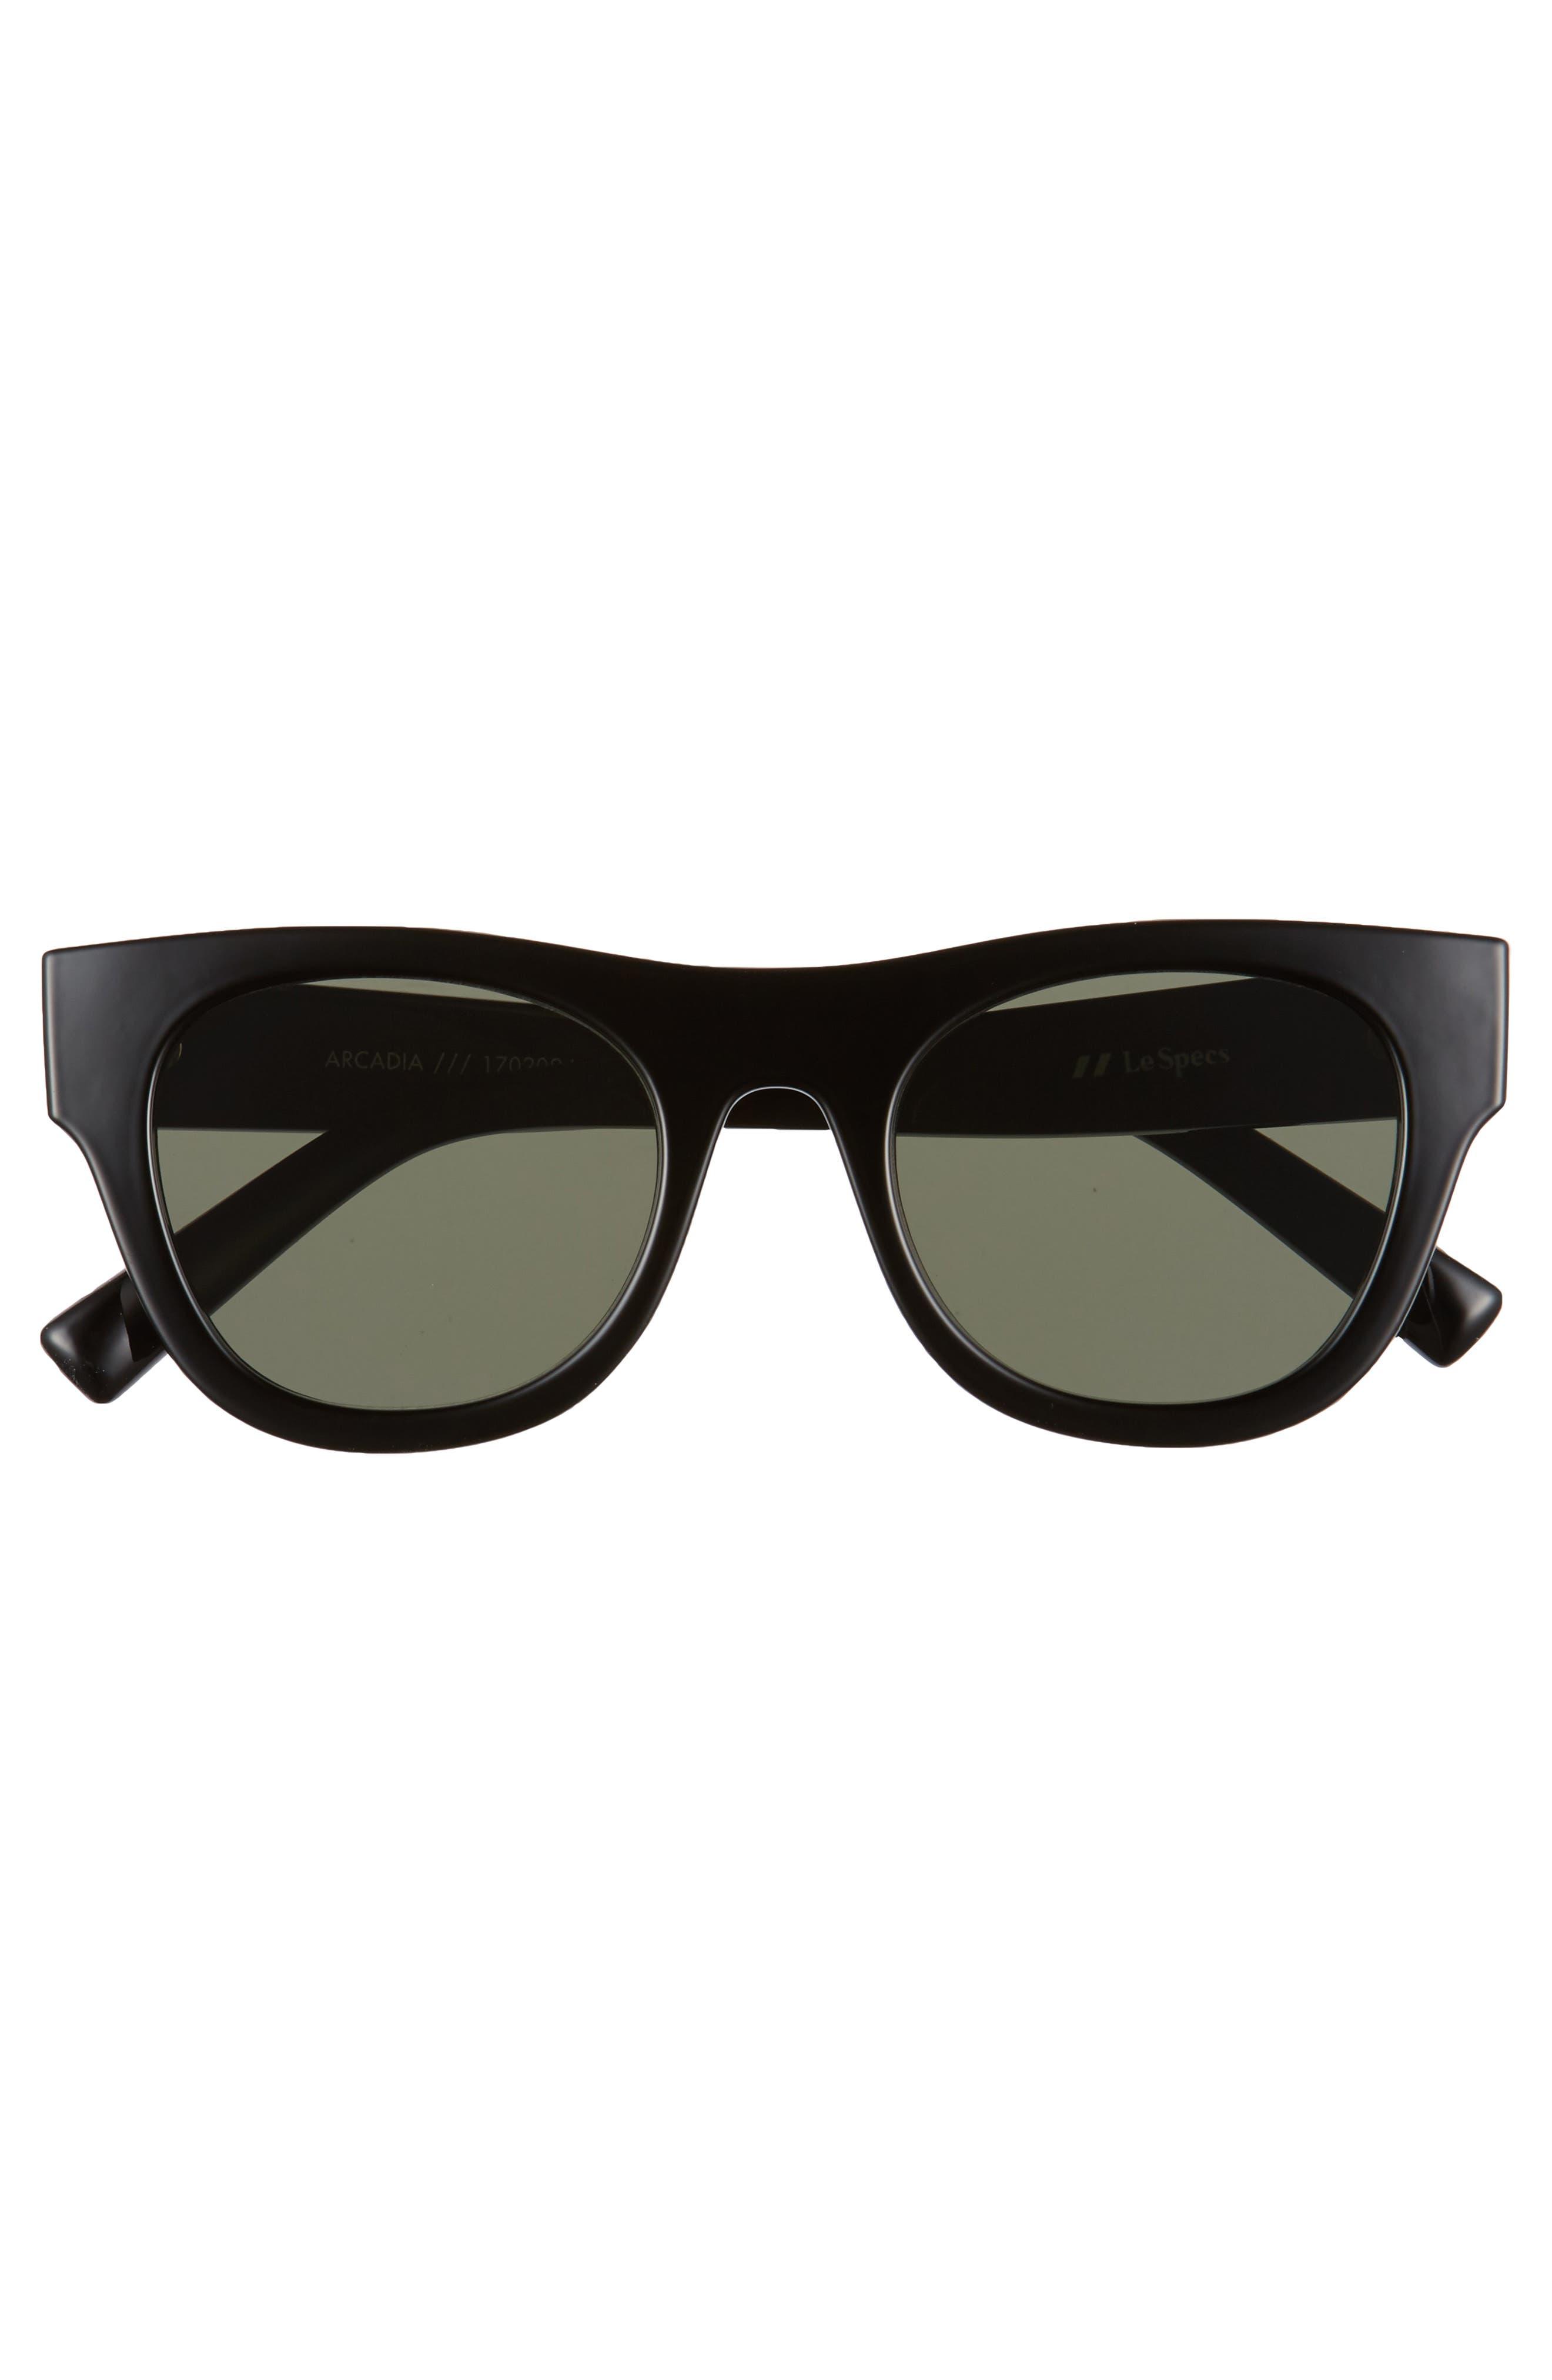 Arcadia 49mm Sunglasses,                             Alternate thumbnail 2, color,                             Black